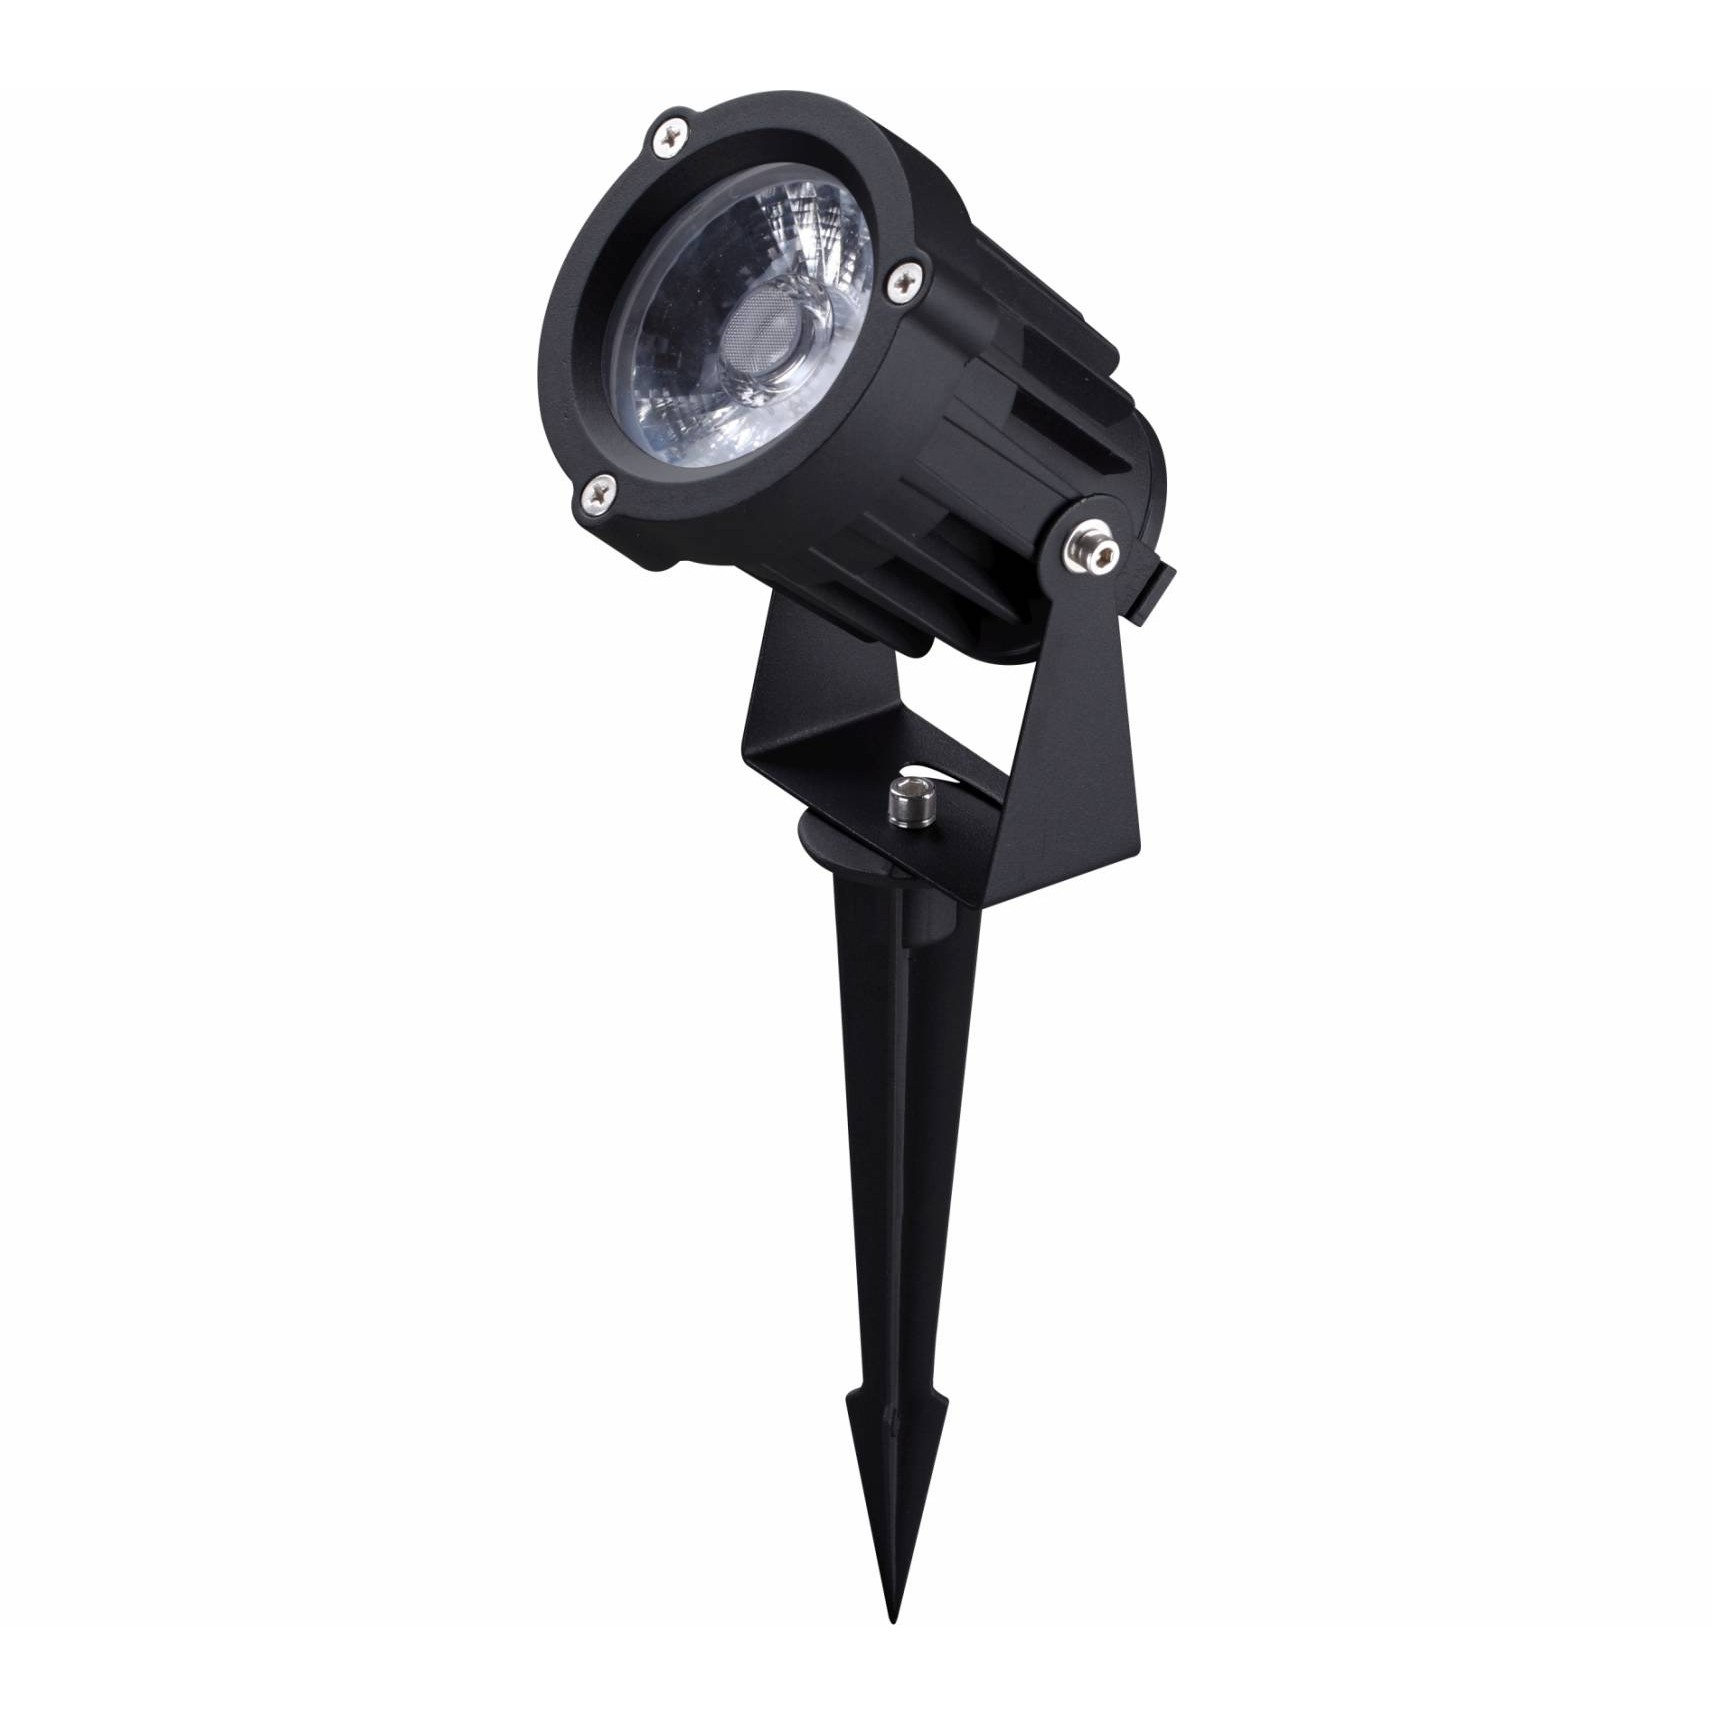 Luminaria de Jardim Espeto LED 10W Verde Bivolt - Glight